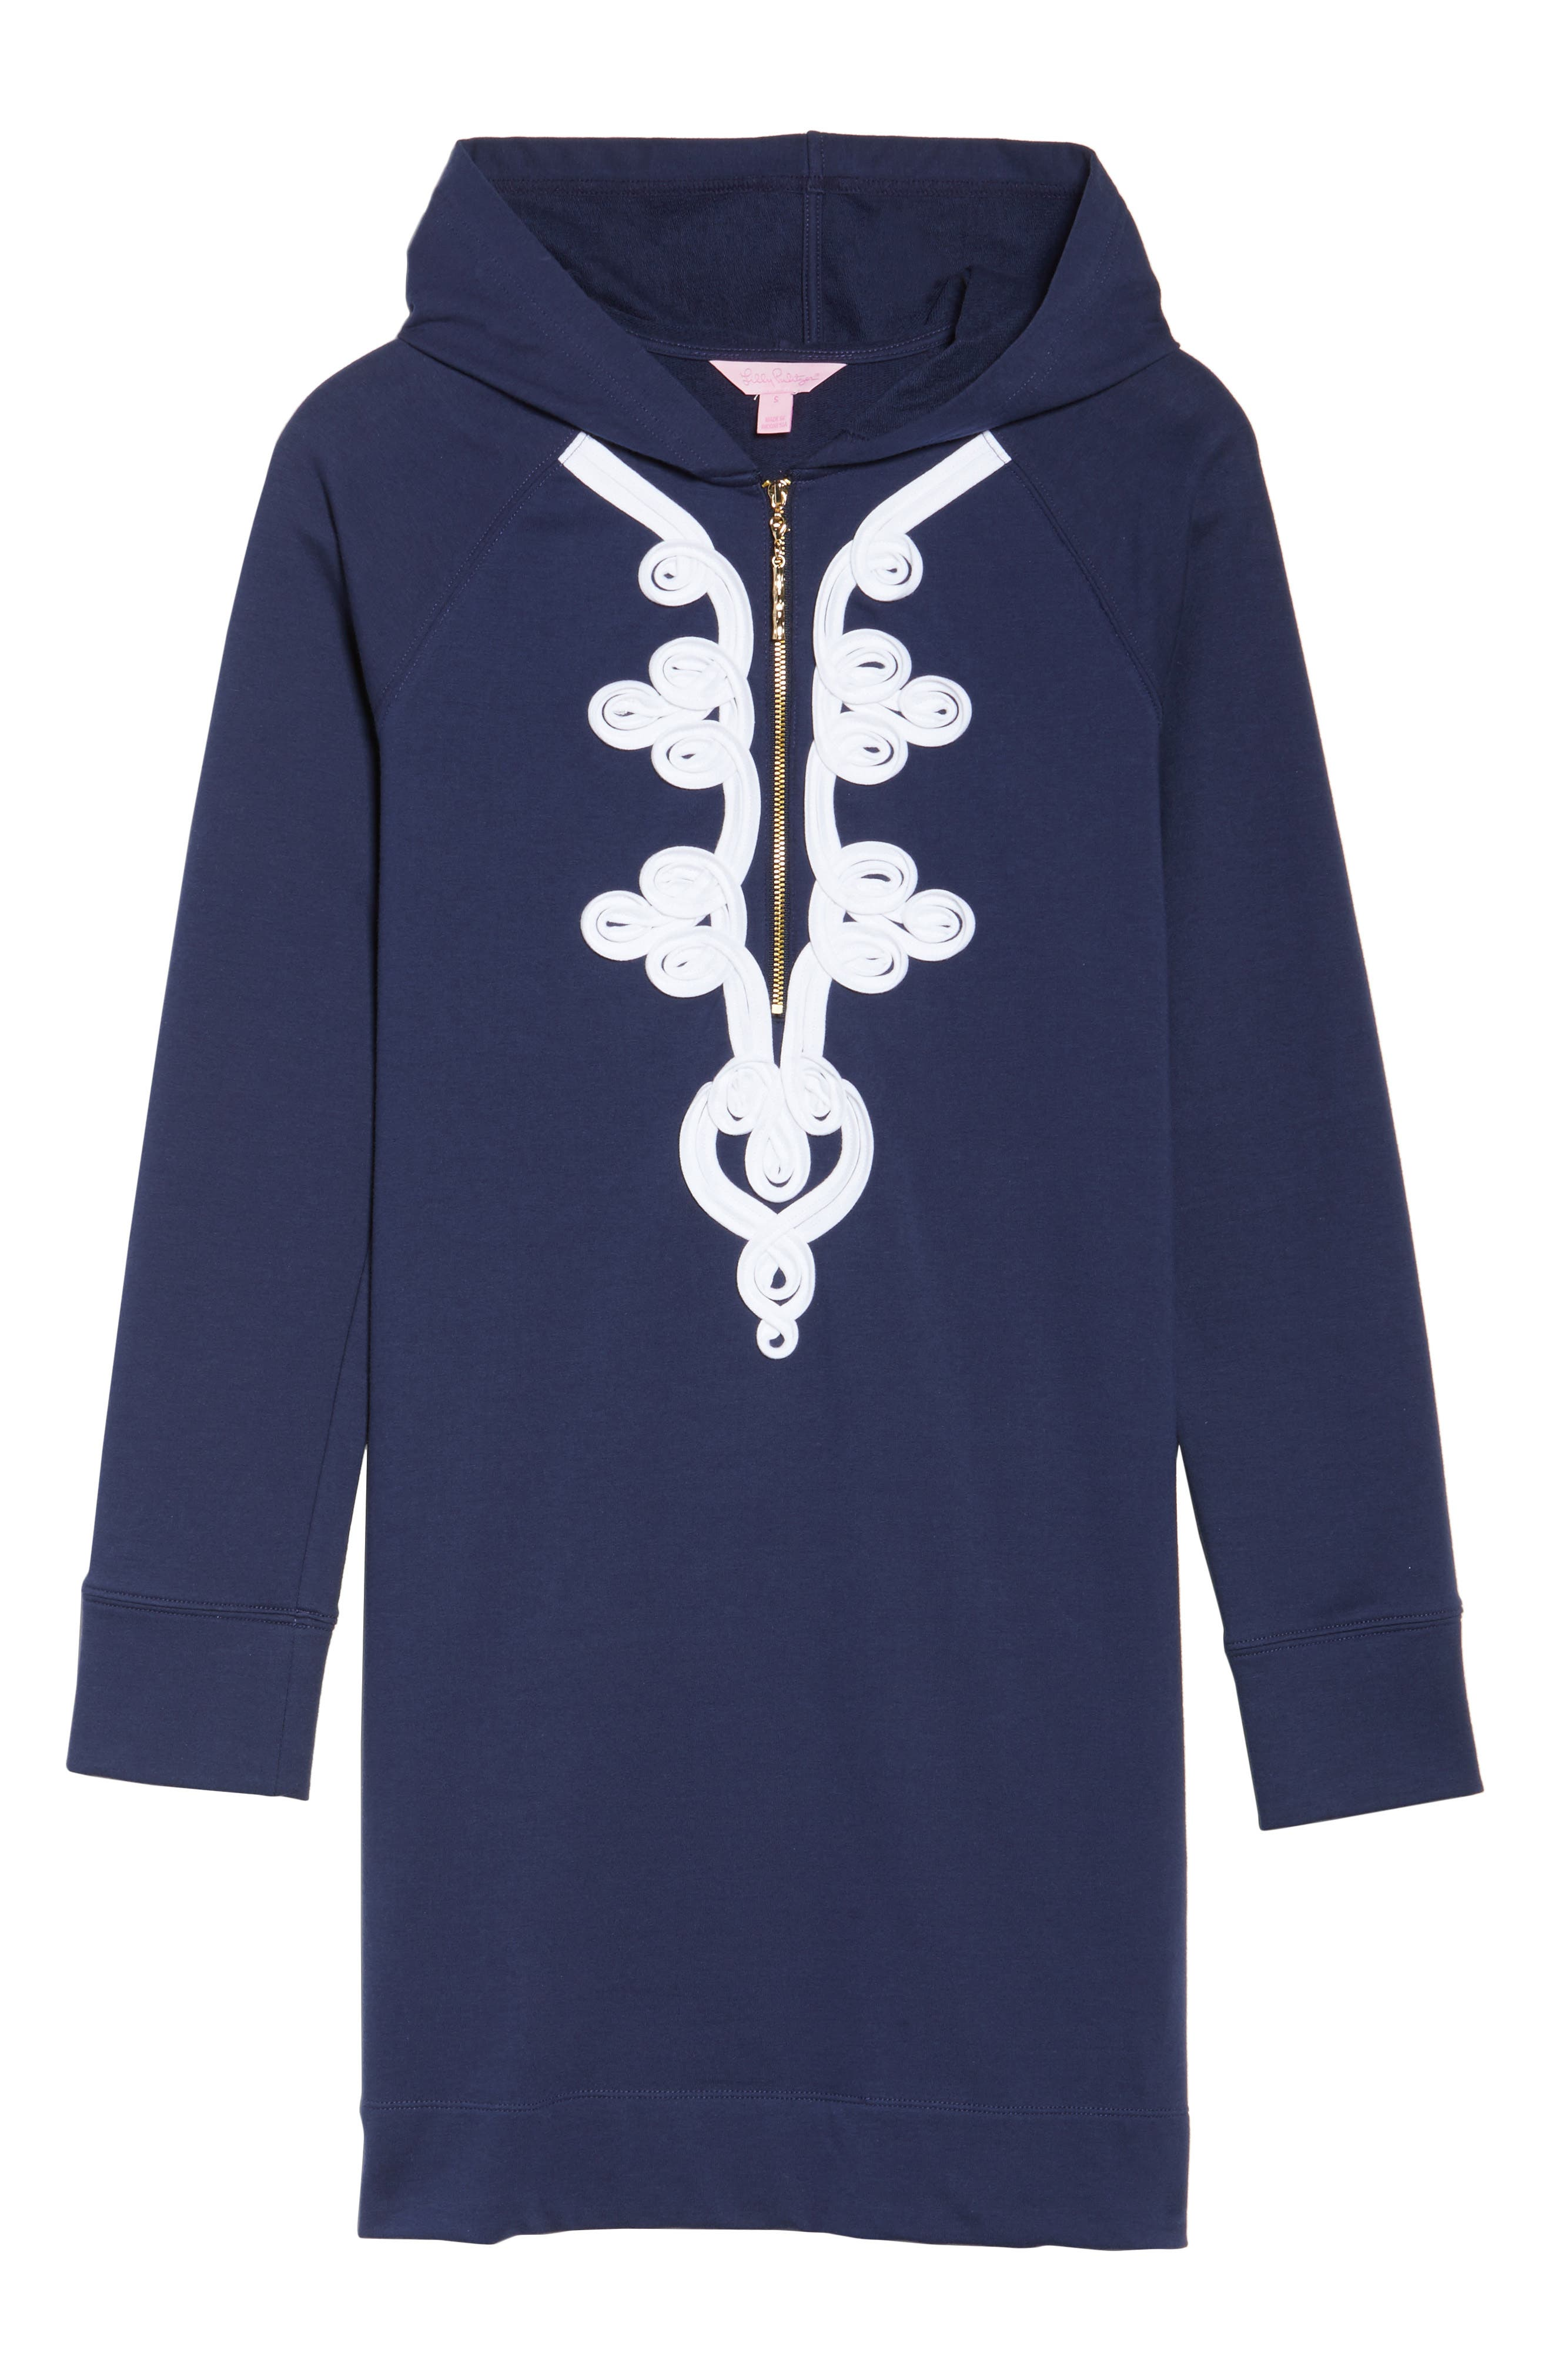 Skipper UPF 50+ Hooded Shift Dress,                             Alternate thumbnail 6, color,                             True Navy